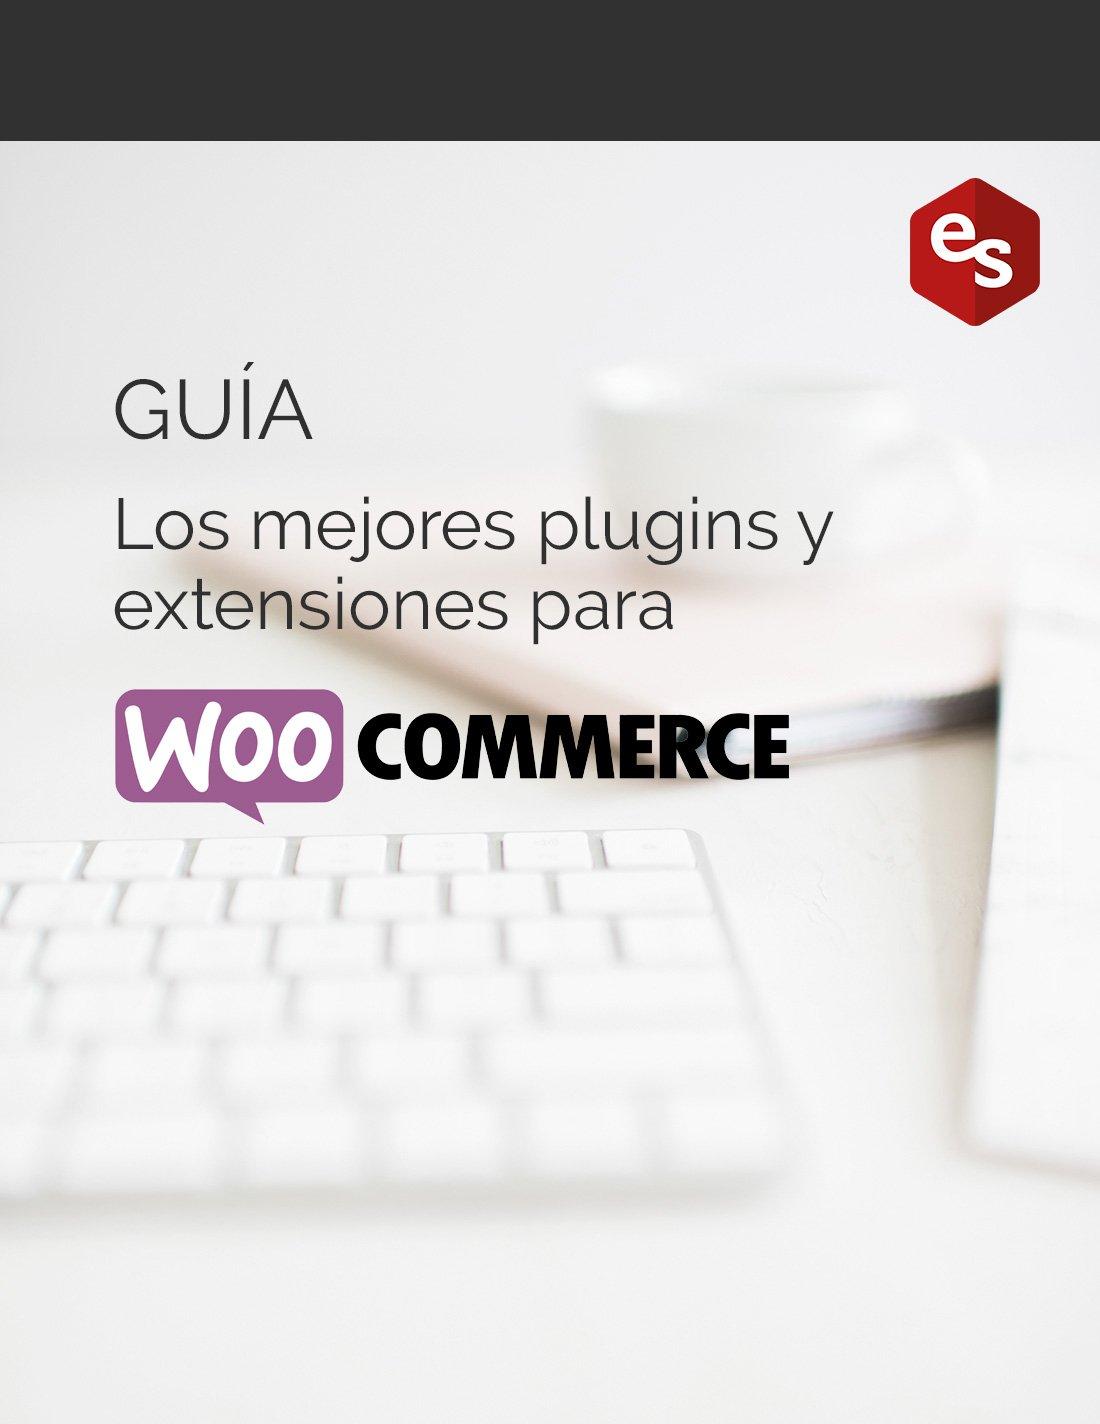 Guía WooCommerce